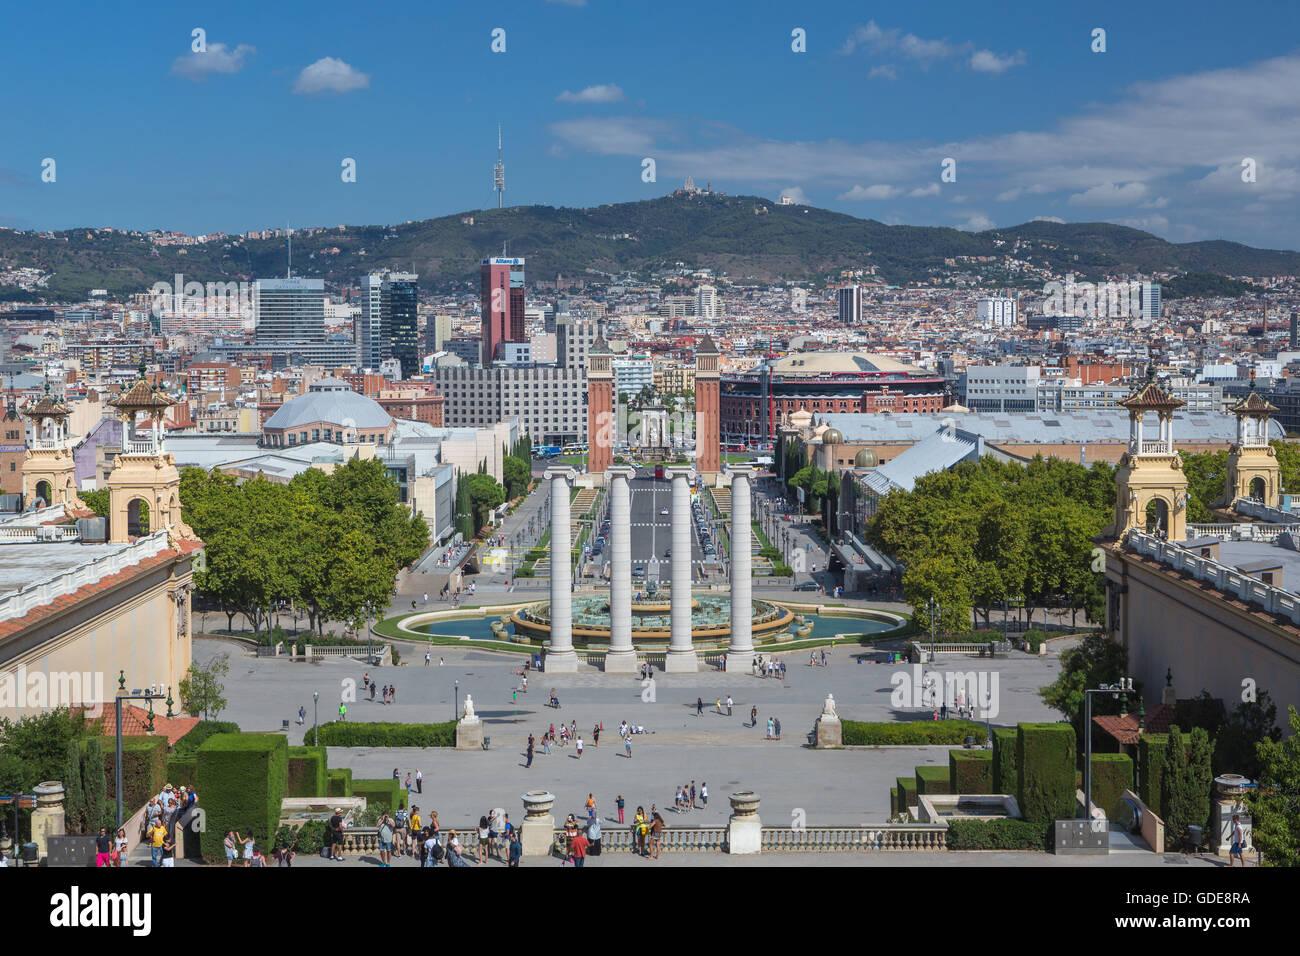 Spain,Catalonia,Barcelona City,Montjuich Hill,Venetian towers,Espana square - Stock Image